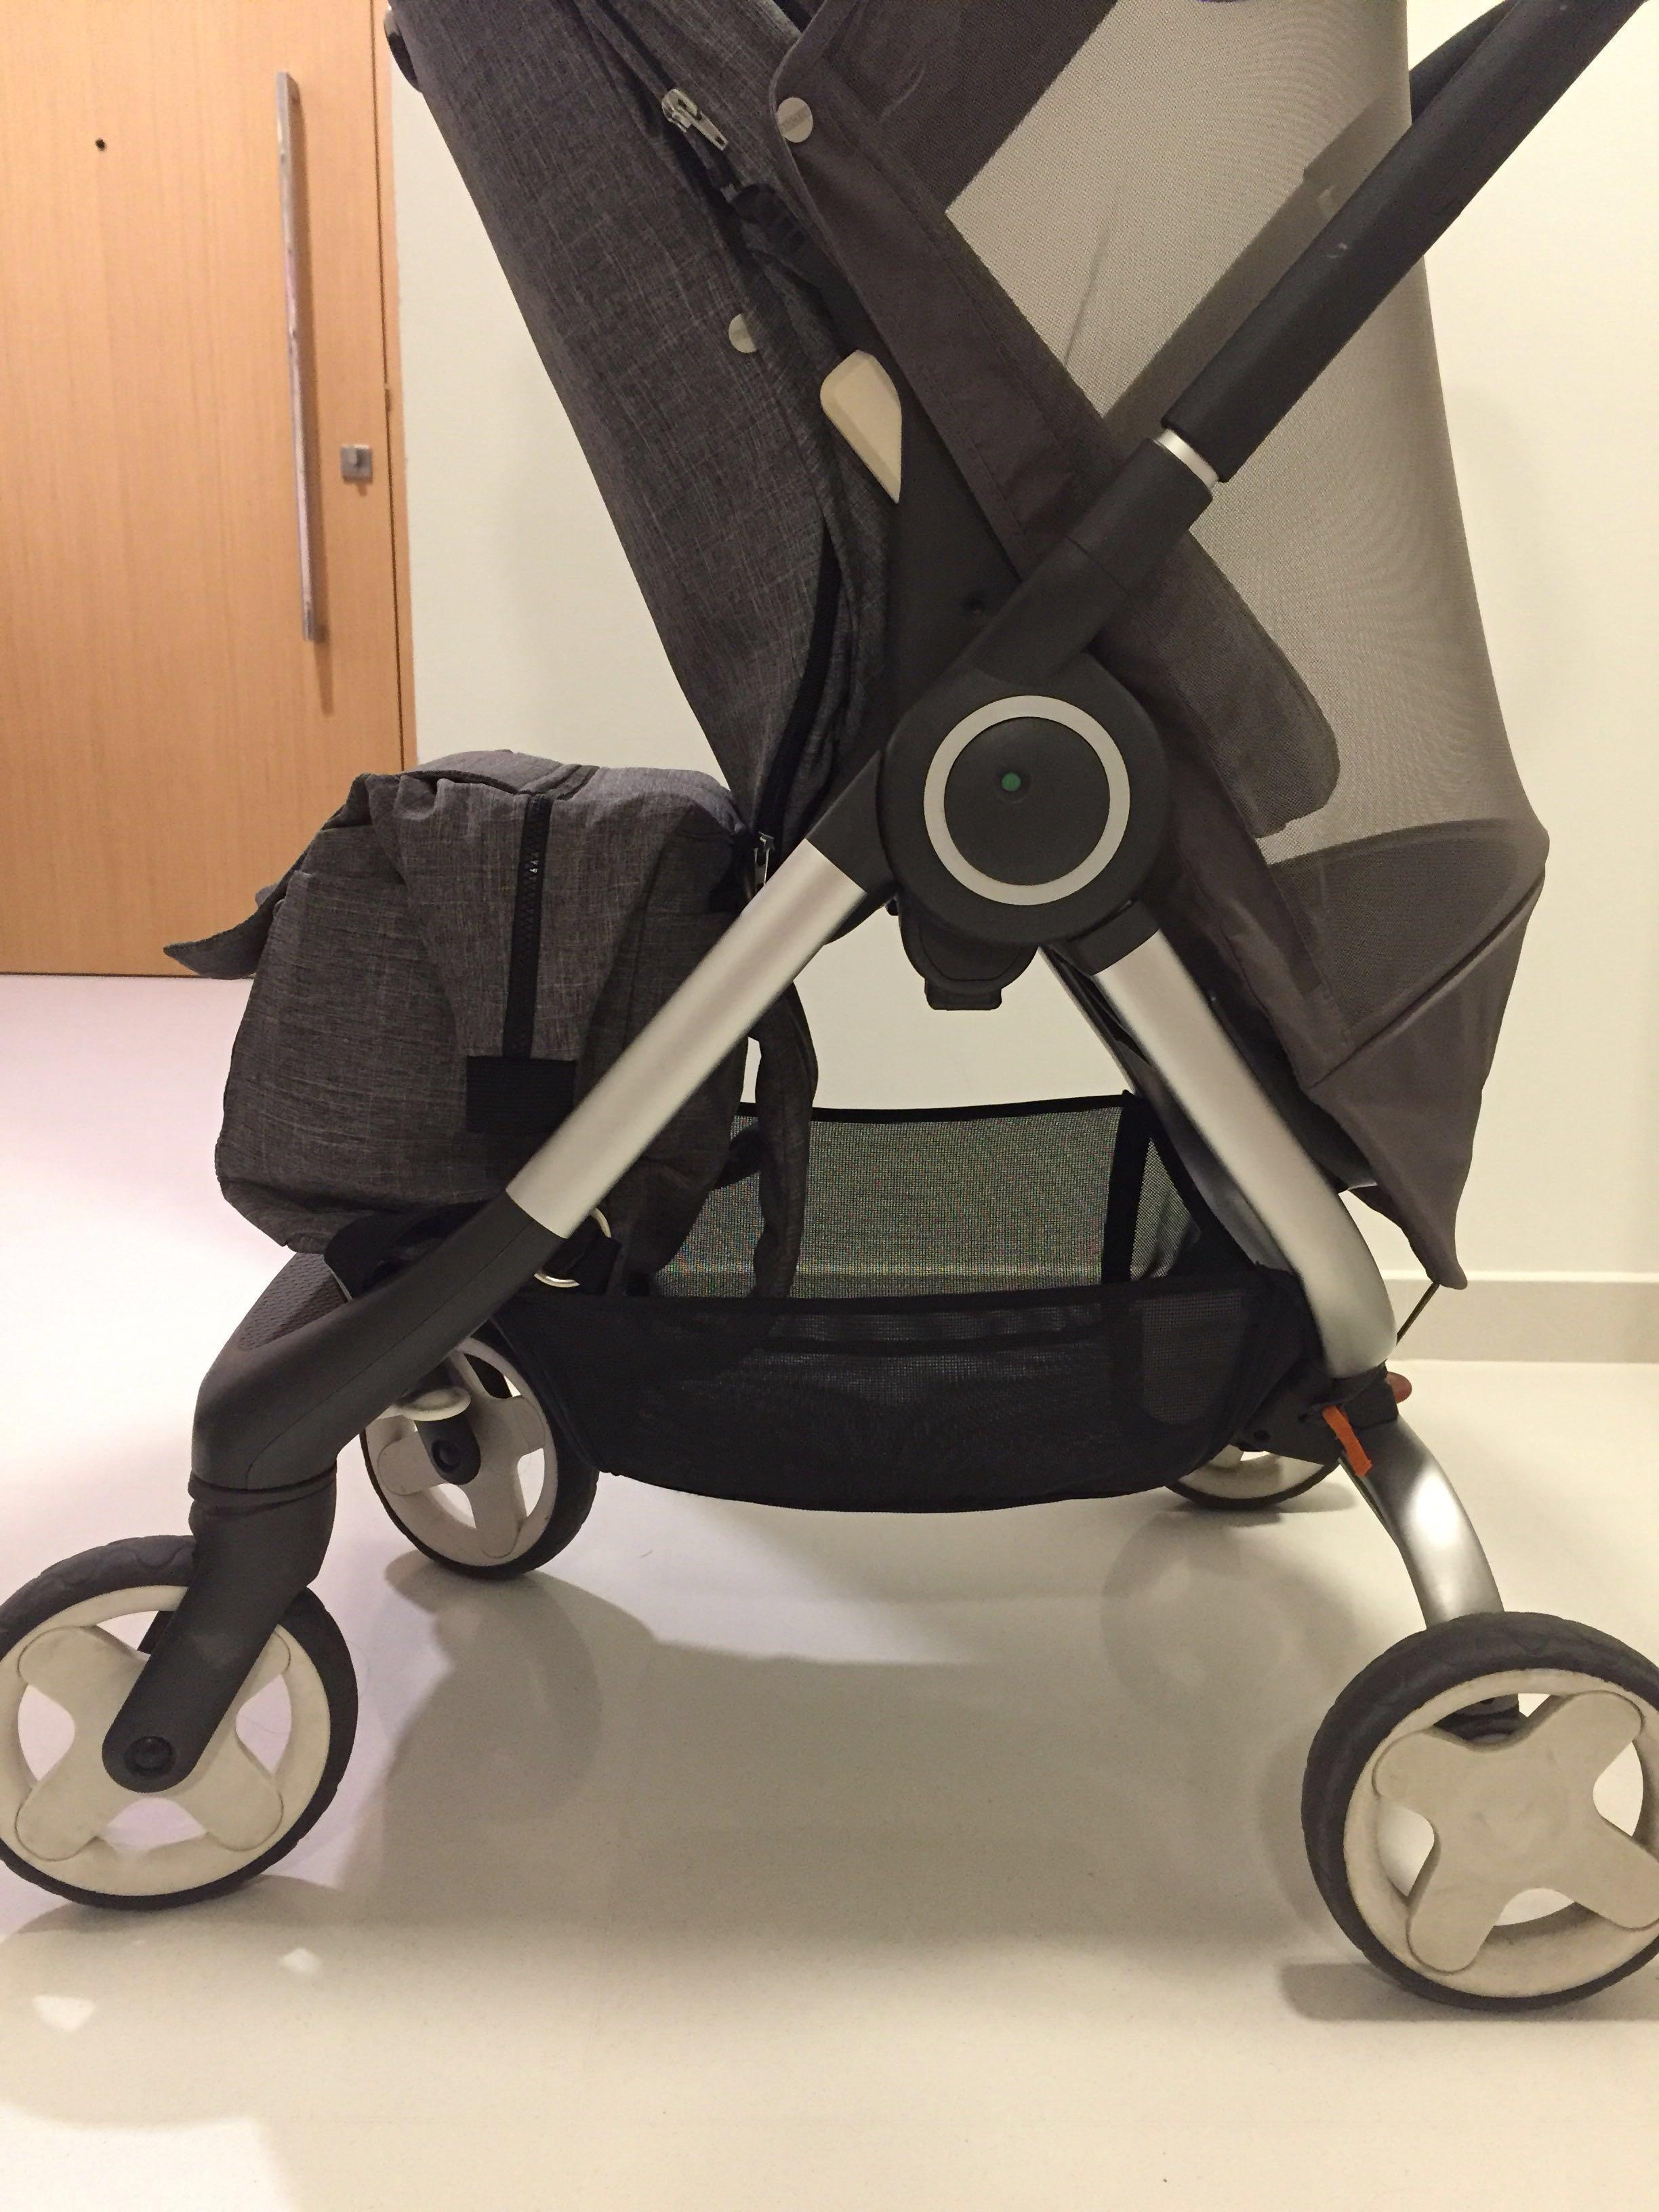 900a4d2934d51 Stokke Scoot v1 in black melange + stokke changing bag, Babies & Kids,  Strollers, Bags & Carriers on Carousell